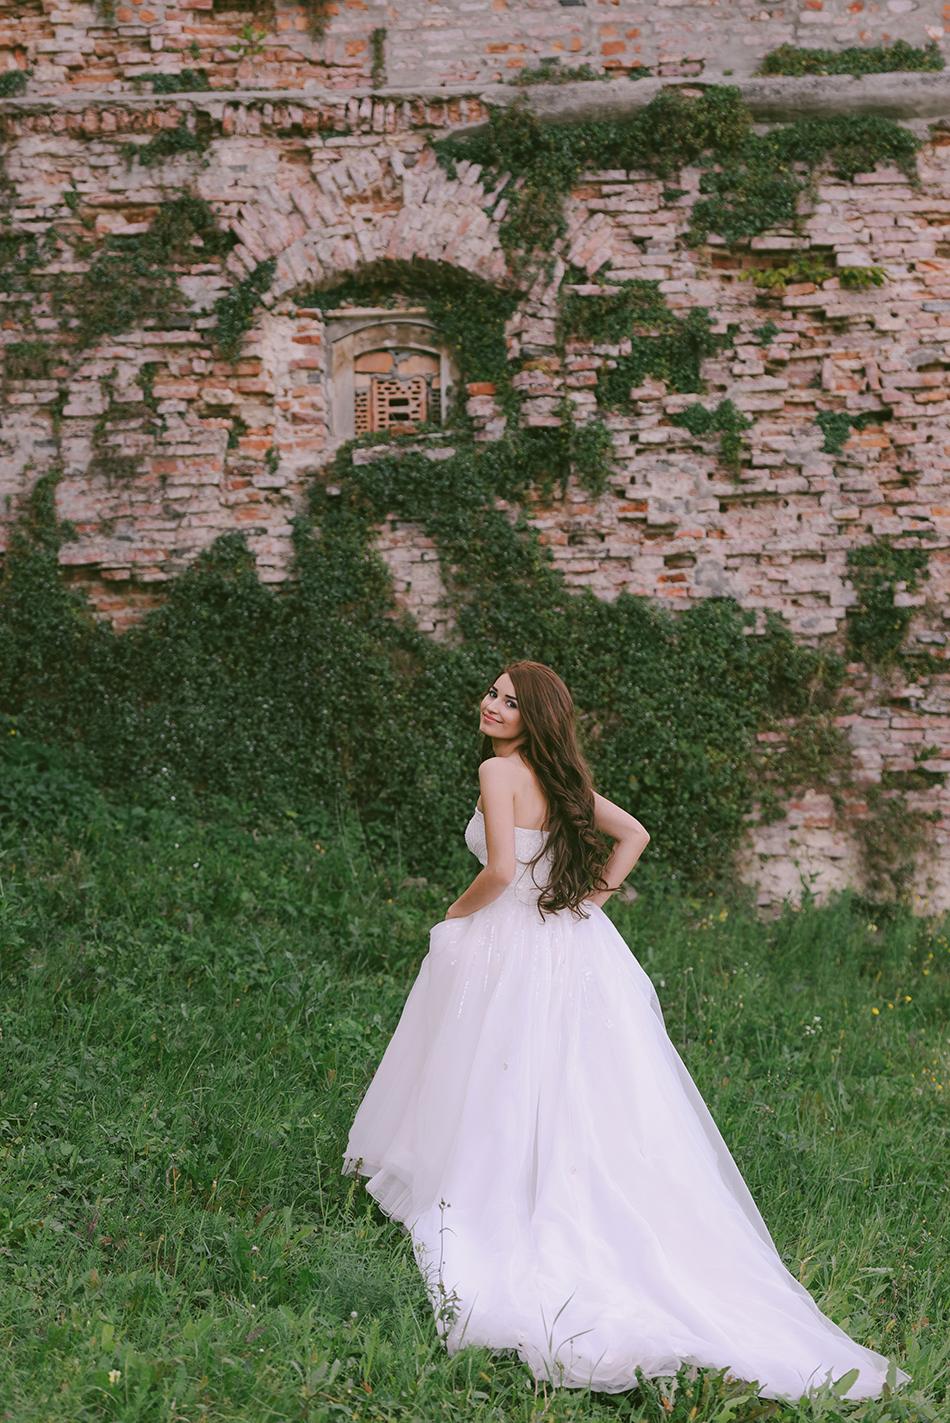 AD Passion Photography | fotograf-nunta-brasov-poiana-brasov-fotograf-profesionist_lorena-cristi_ttd_0008 | Adelin, Dida, fotograf profesionist, fotograf de nunta, fotografie de nunta, fotograf Timisoara, fotograf Craiova, fotograf Bucuresti, fotograf Arad, nunta Timisoara, nunta Arad, nunta Bucuresti, nunta Craiova